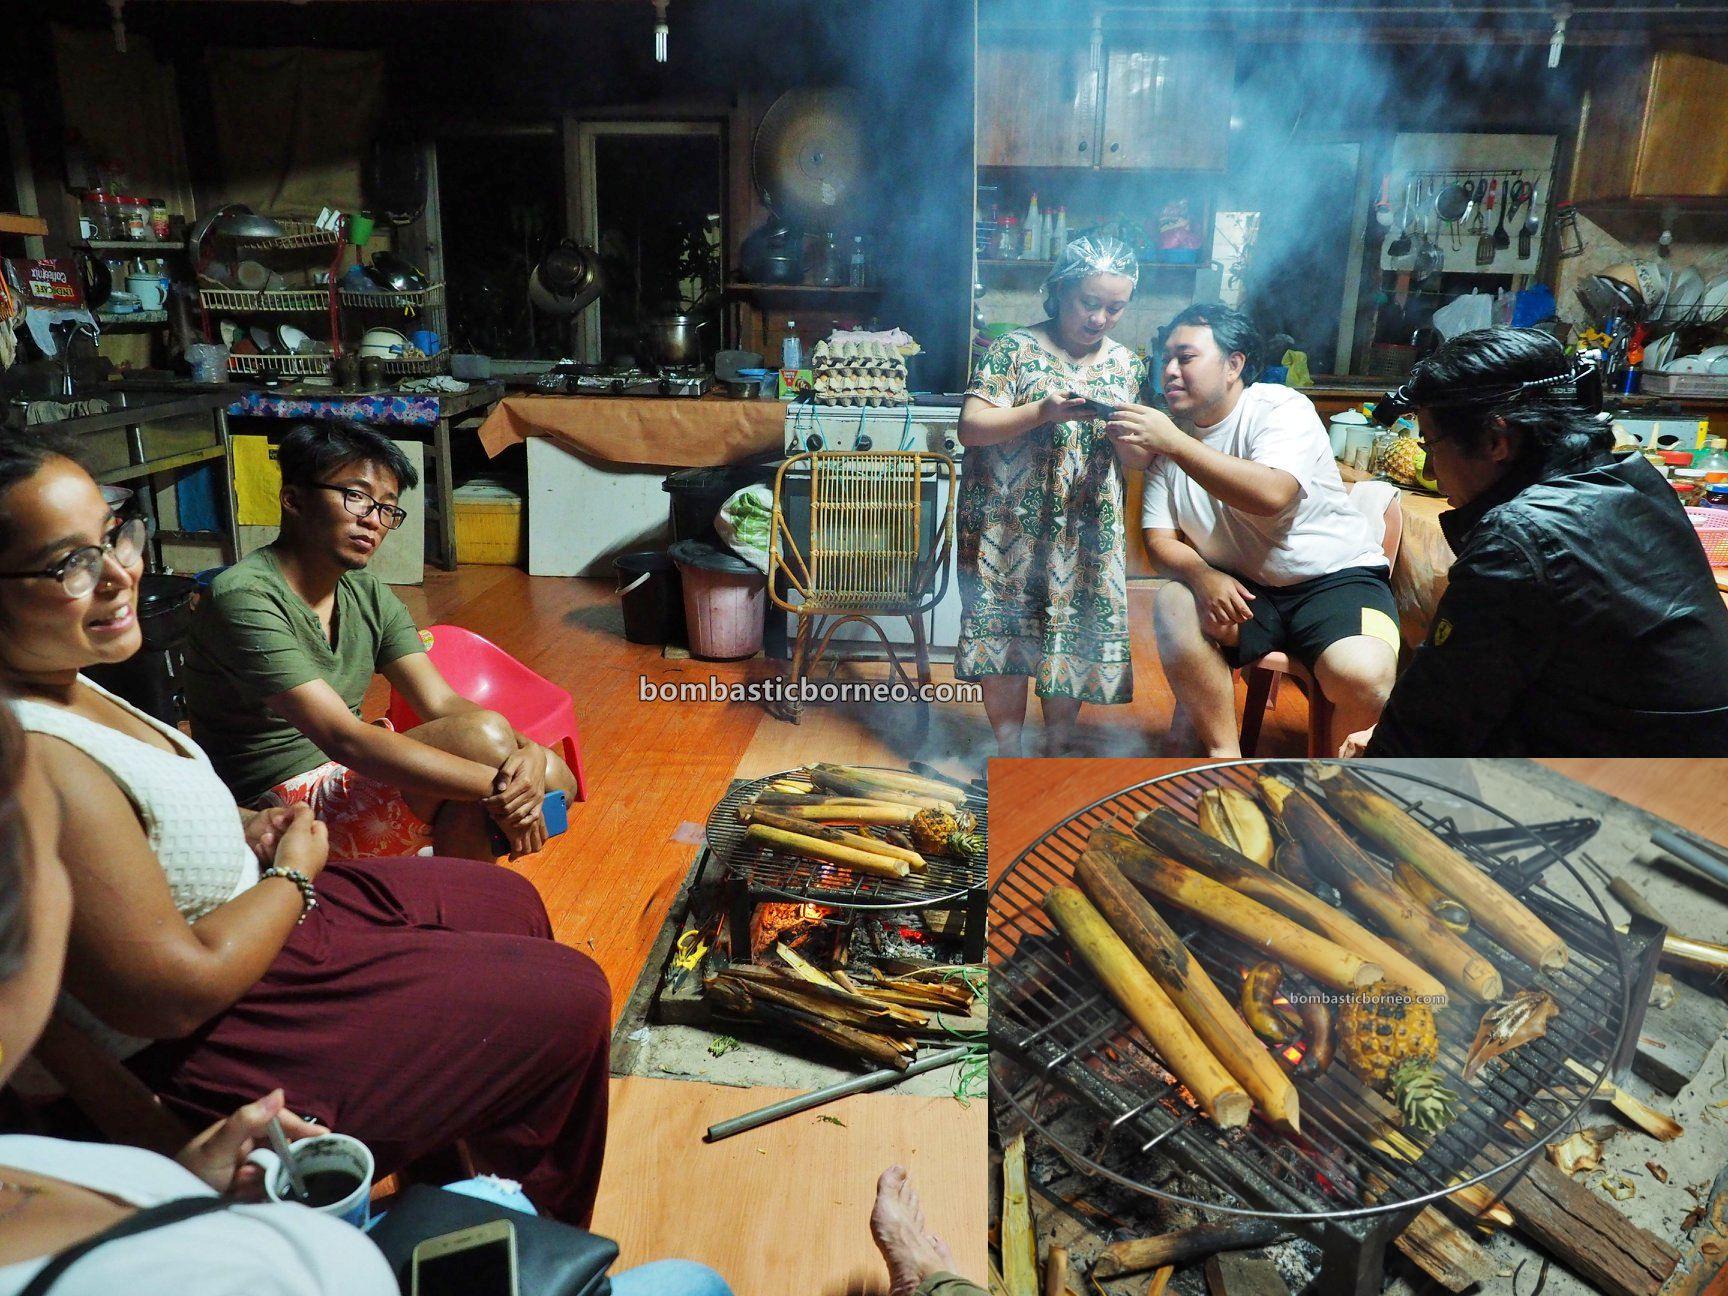 Tanah Tinggi Bario, Kelabit Highlands, tribe, tribal, backpackers, destination, exploration, Interior village, Dayak, native, travel, Trans Borneo, 婆罗洲马来西亚, 砂拉越内陆民宿, 巴里奥土著部落,